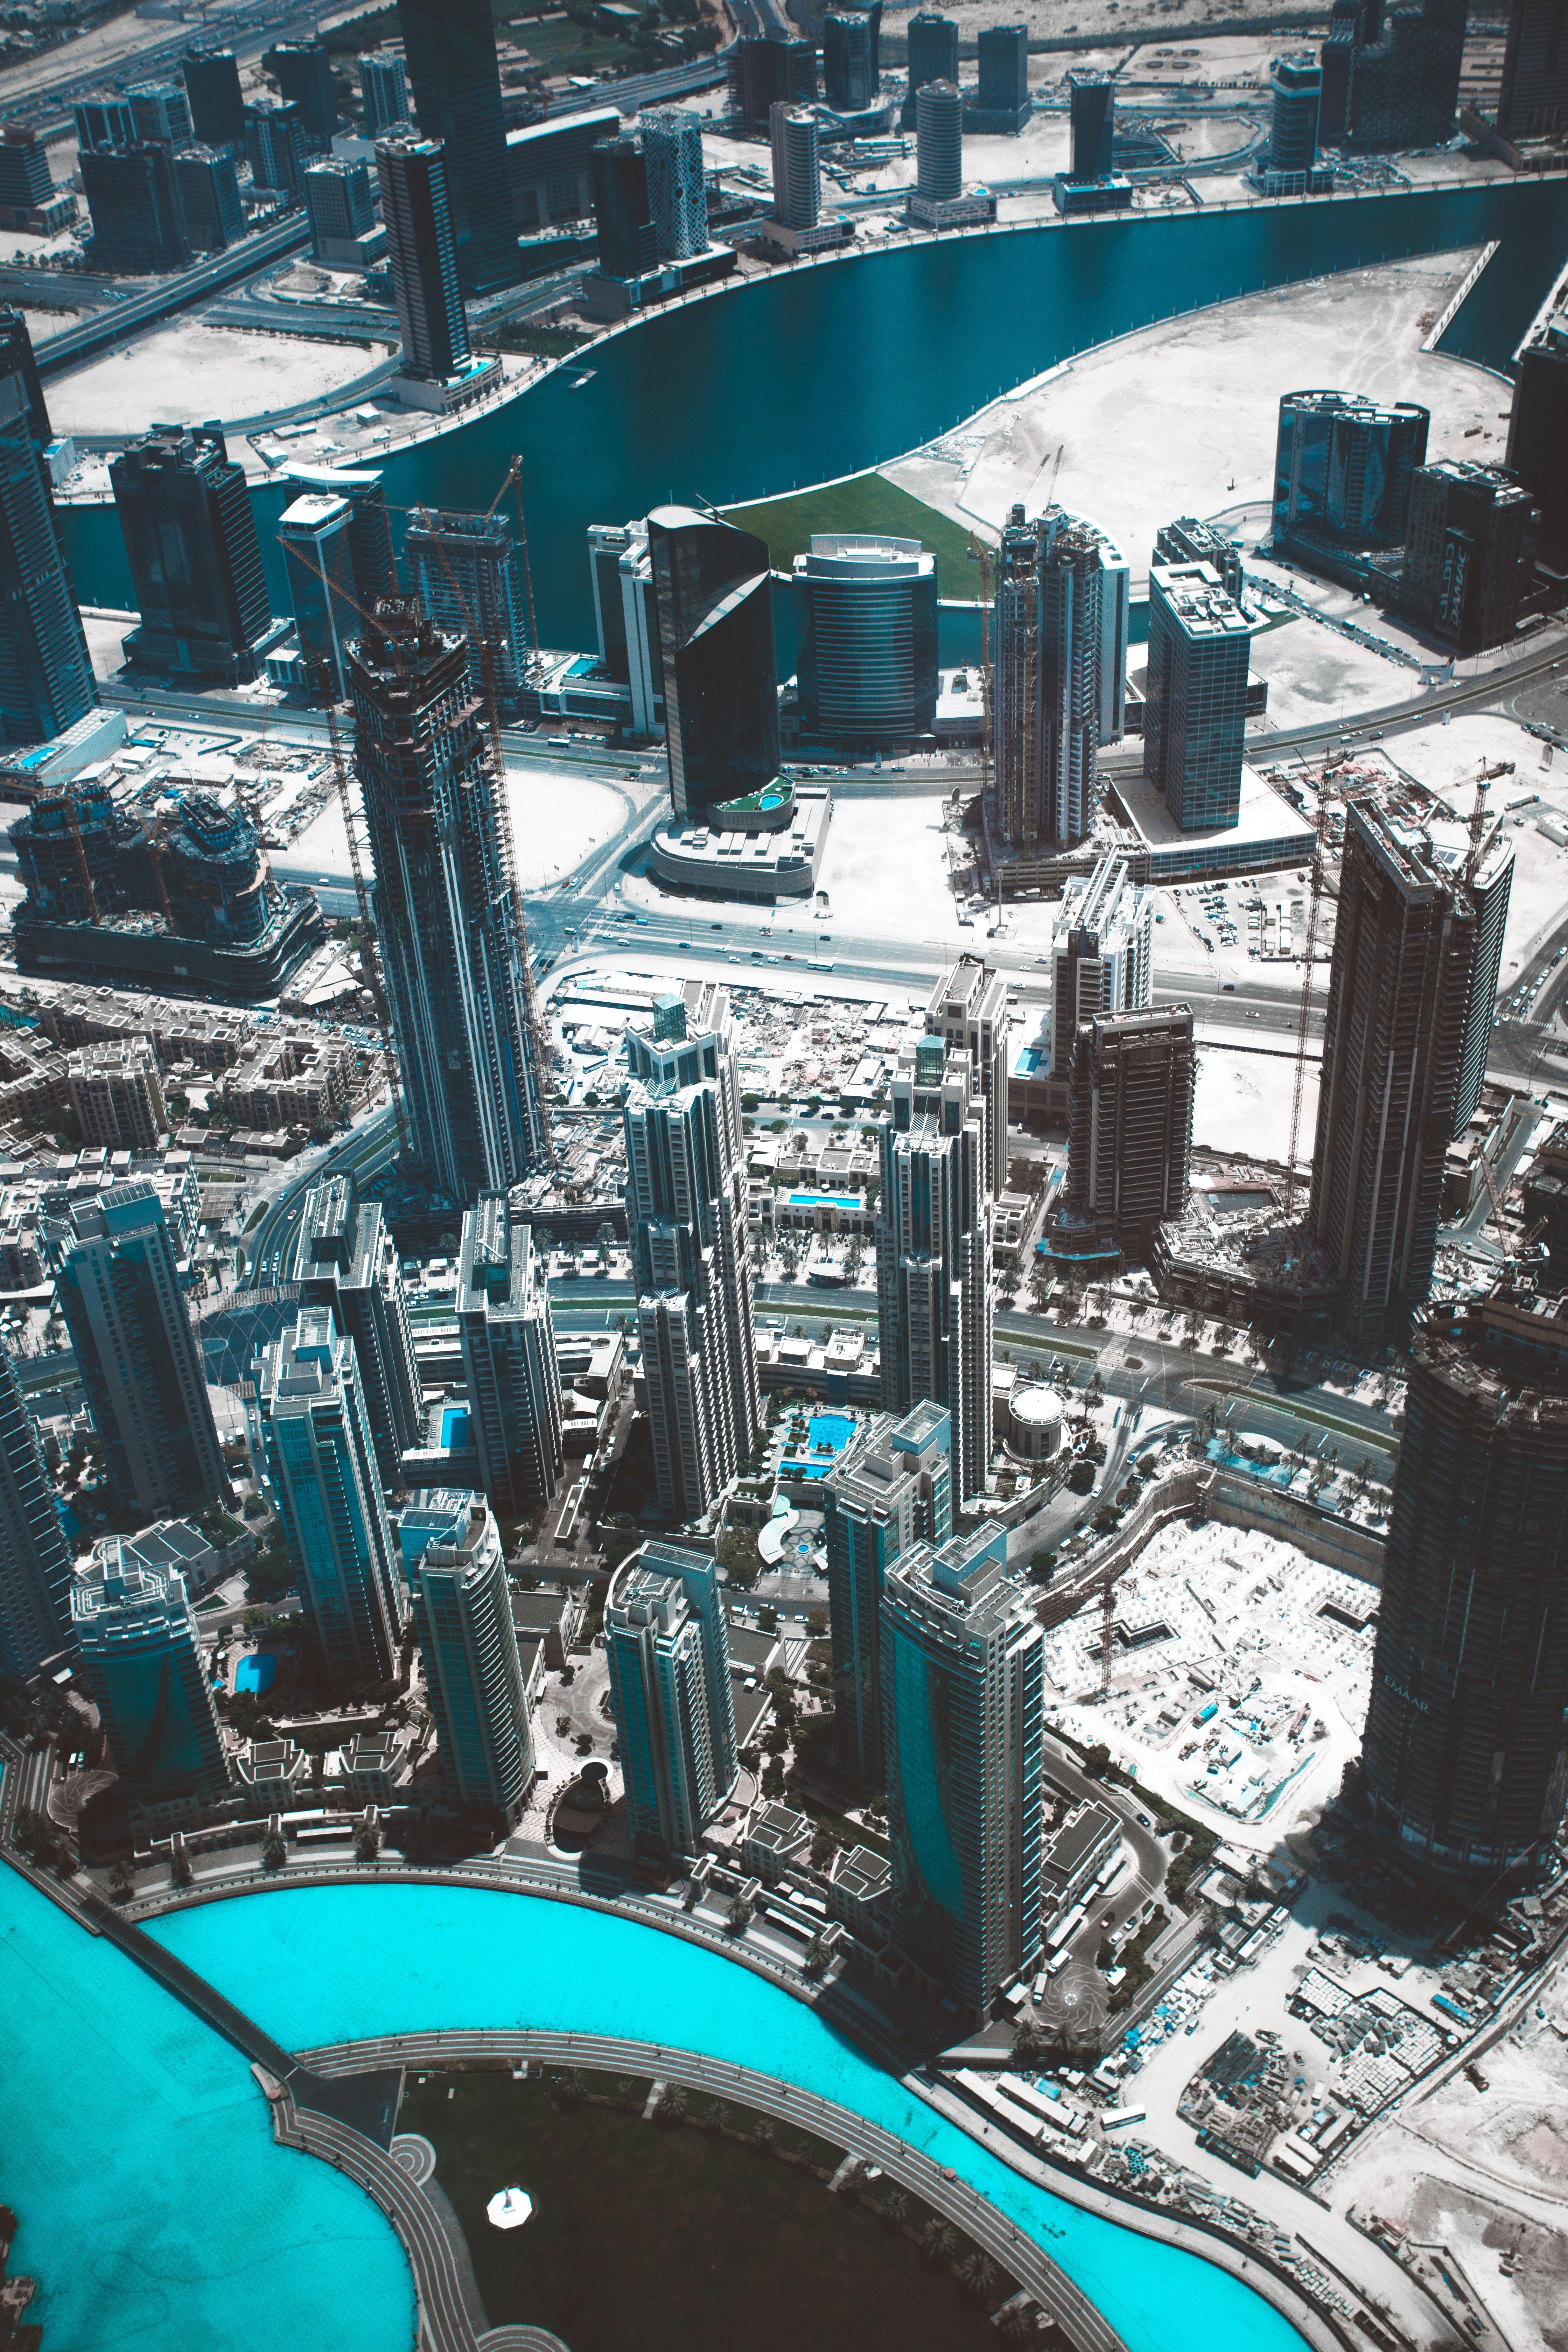 aerial shot of concrete buildings